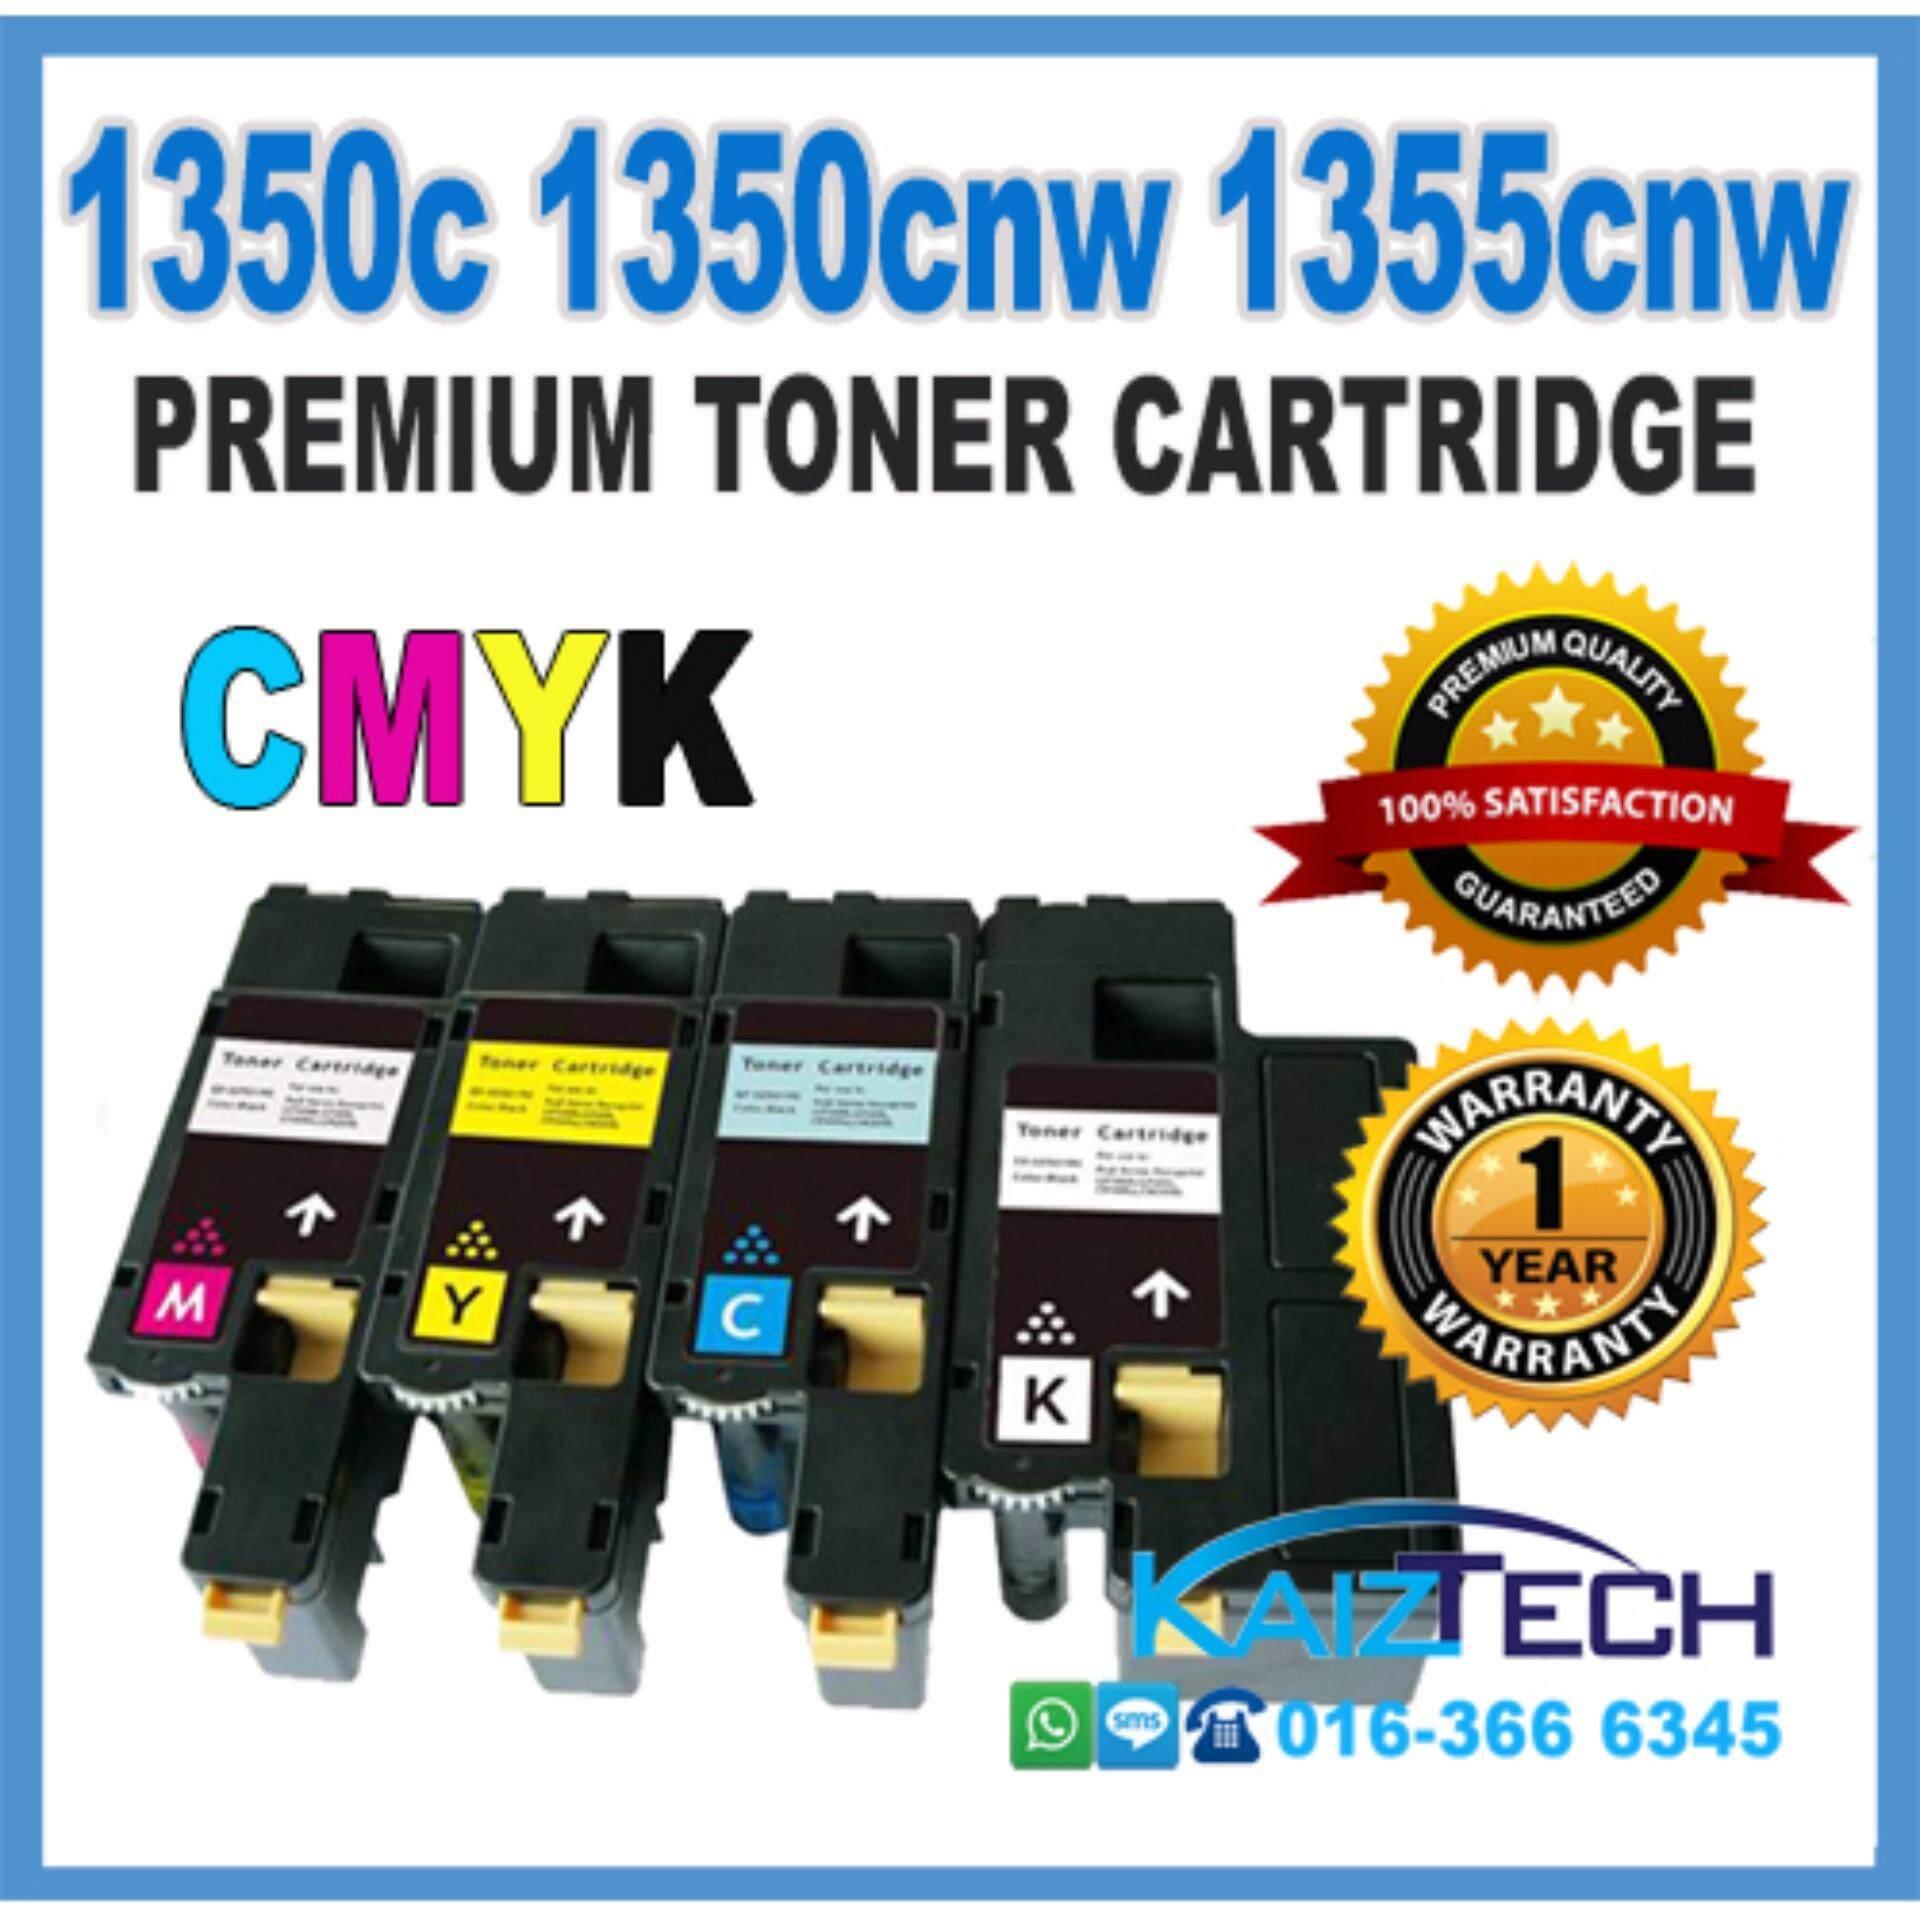 DELL 1250c 1350cnw 1355cn CYMK (4 Color) Premium Compatible Toner Cartridge